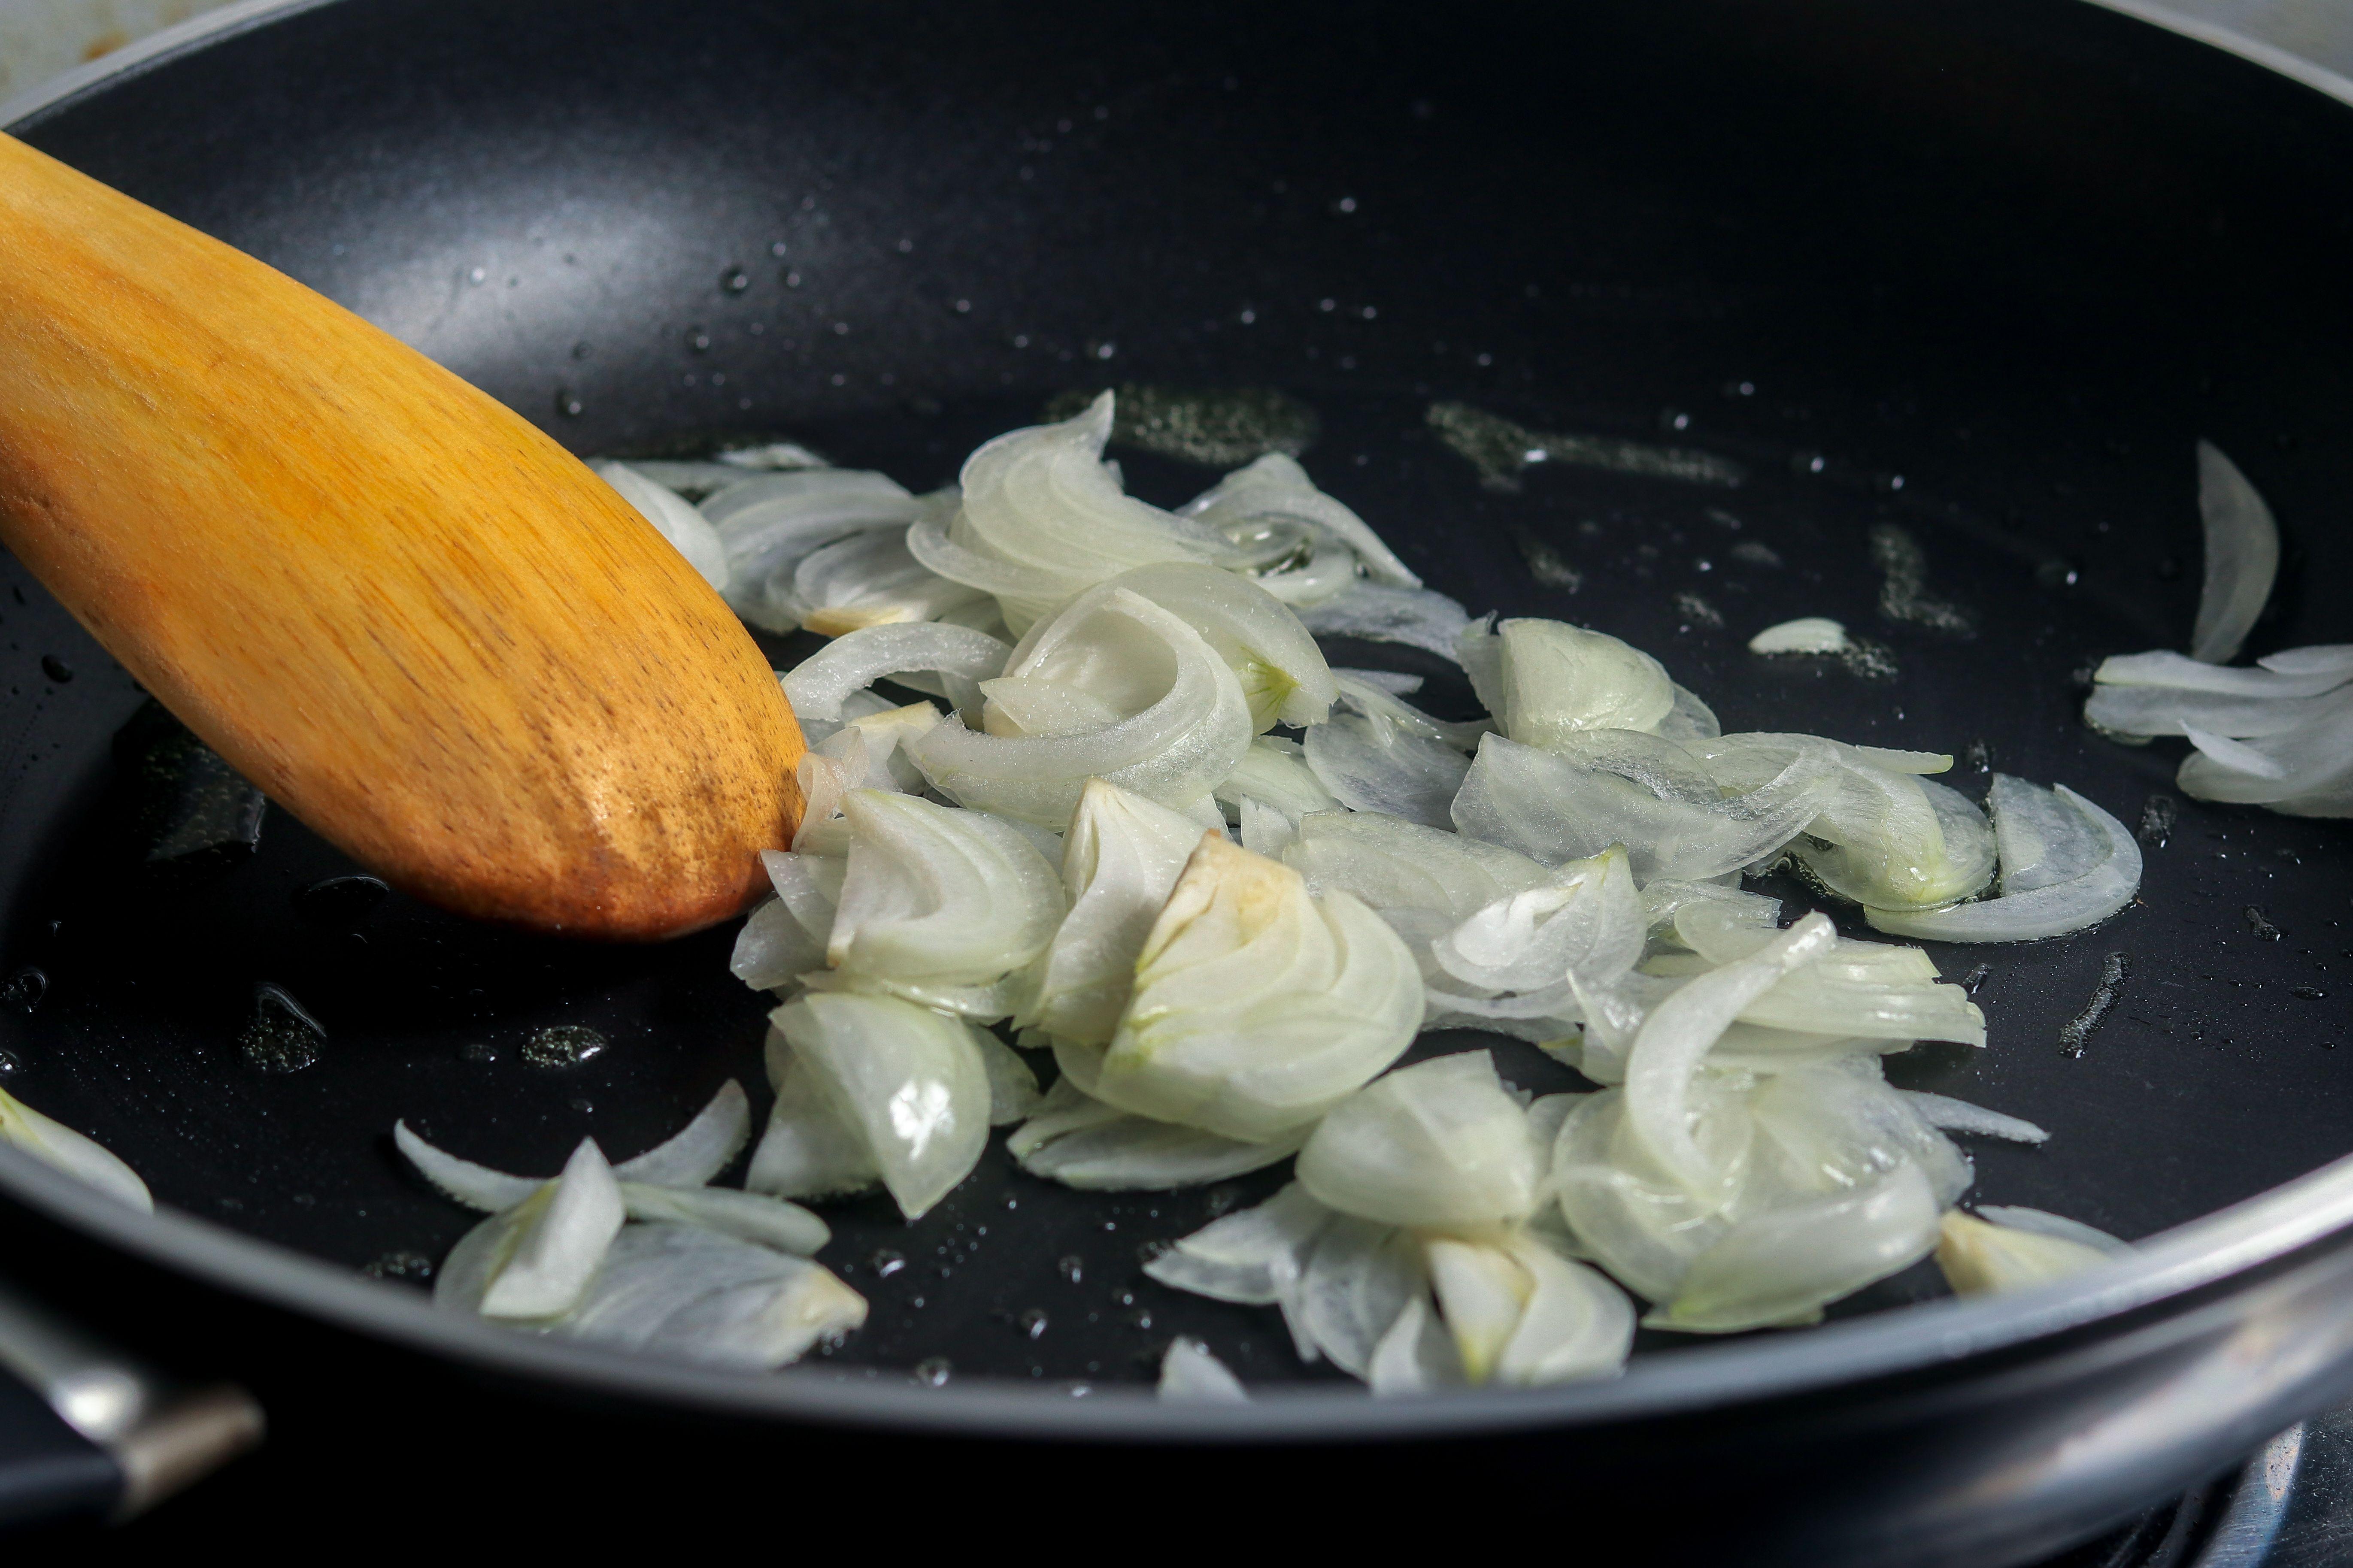 Sautéing onions